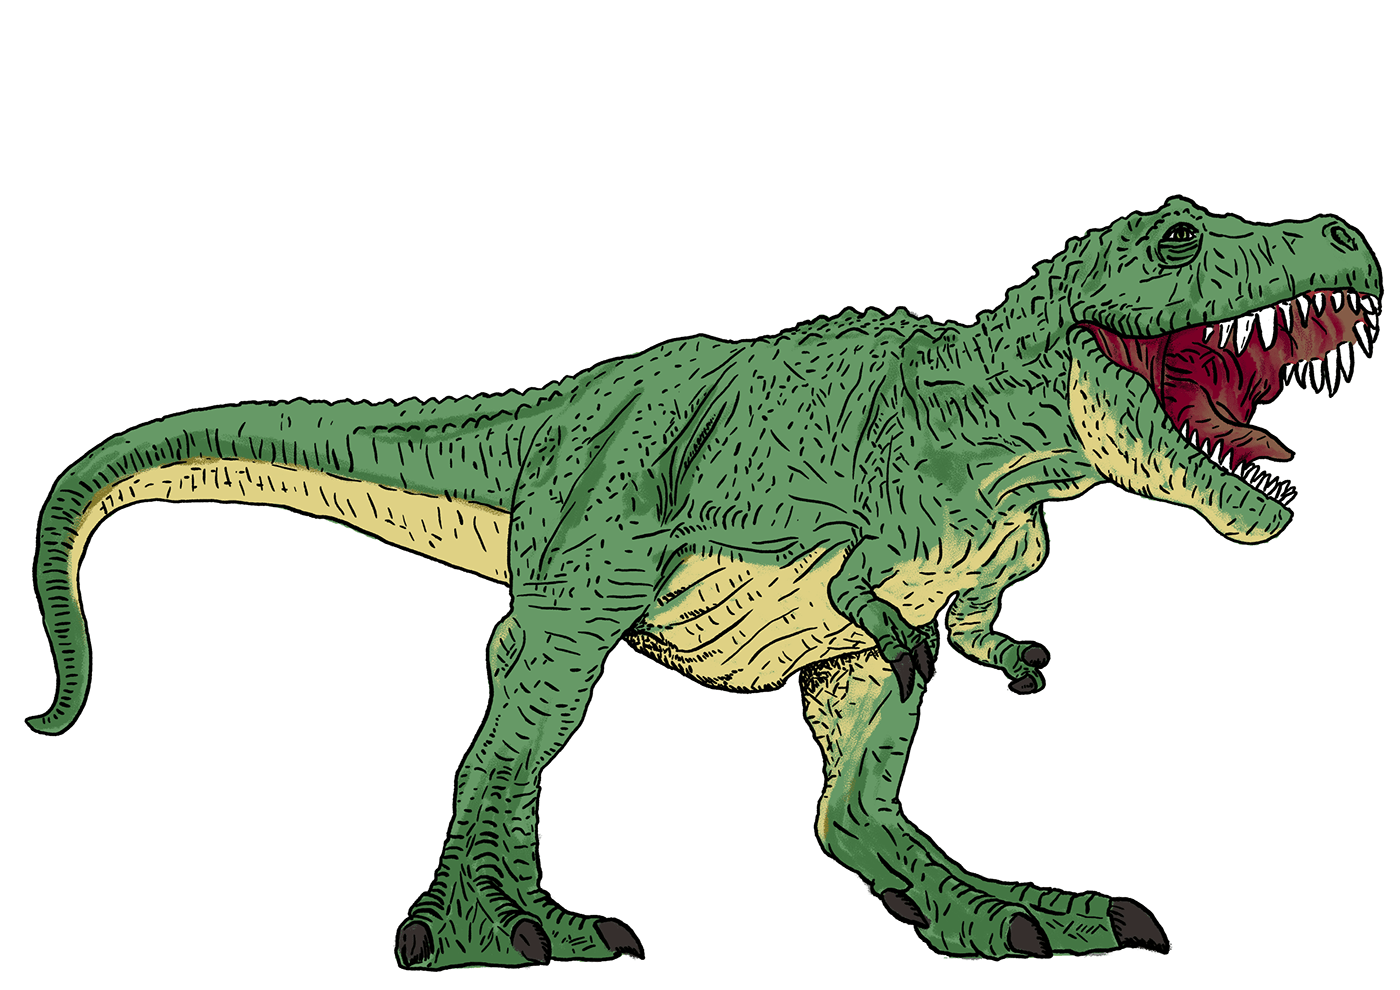 ankylosaure Dino dinosaure ILLUSTRATION  planche naturaliste pteranodon stegosaure trex triceratops wacom